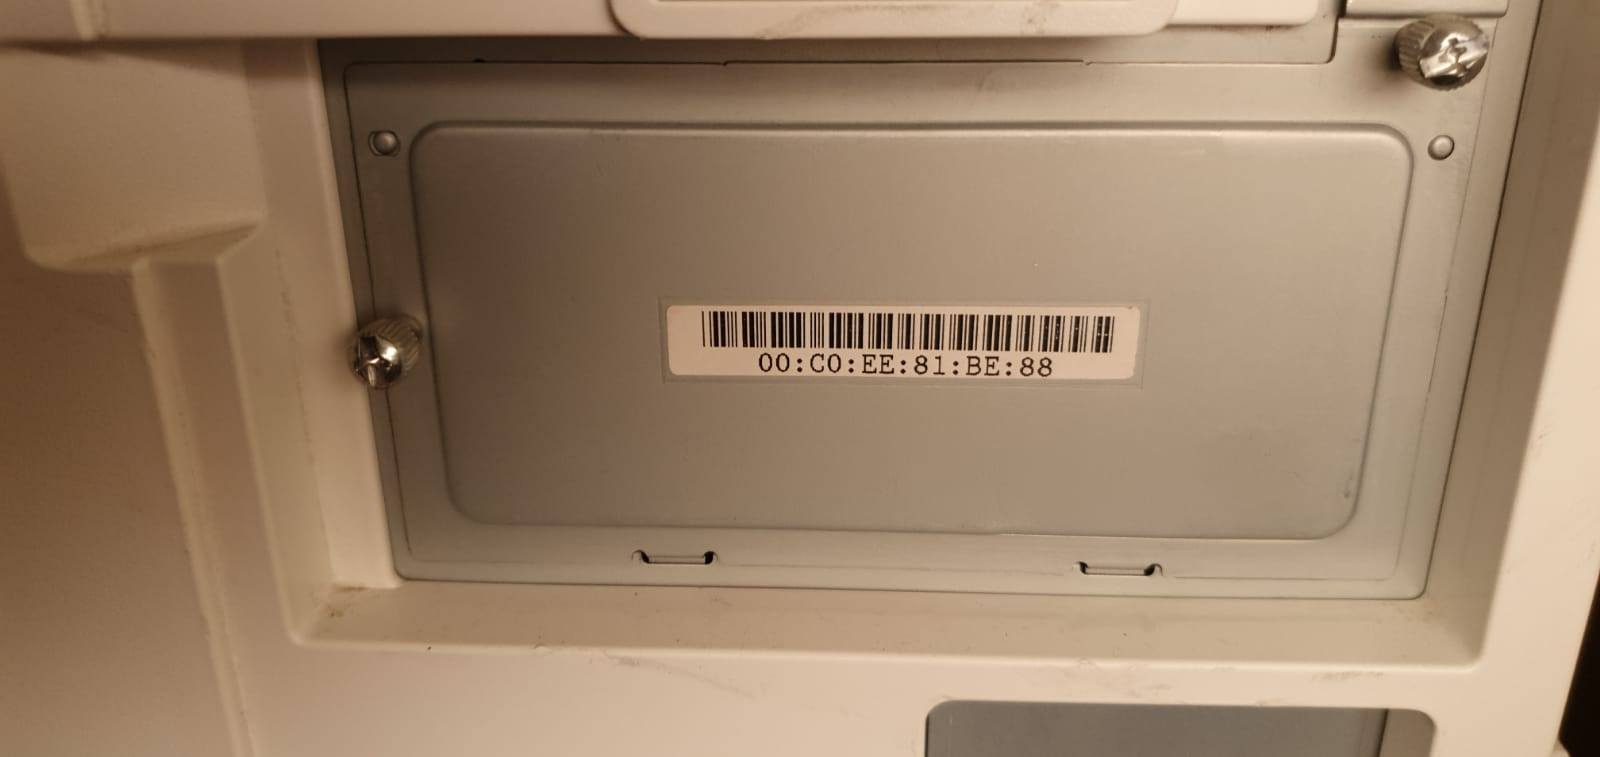 Kyocera Mita FS-C8025MFP Multifunction Colour Laser Printer